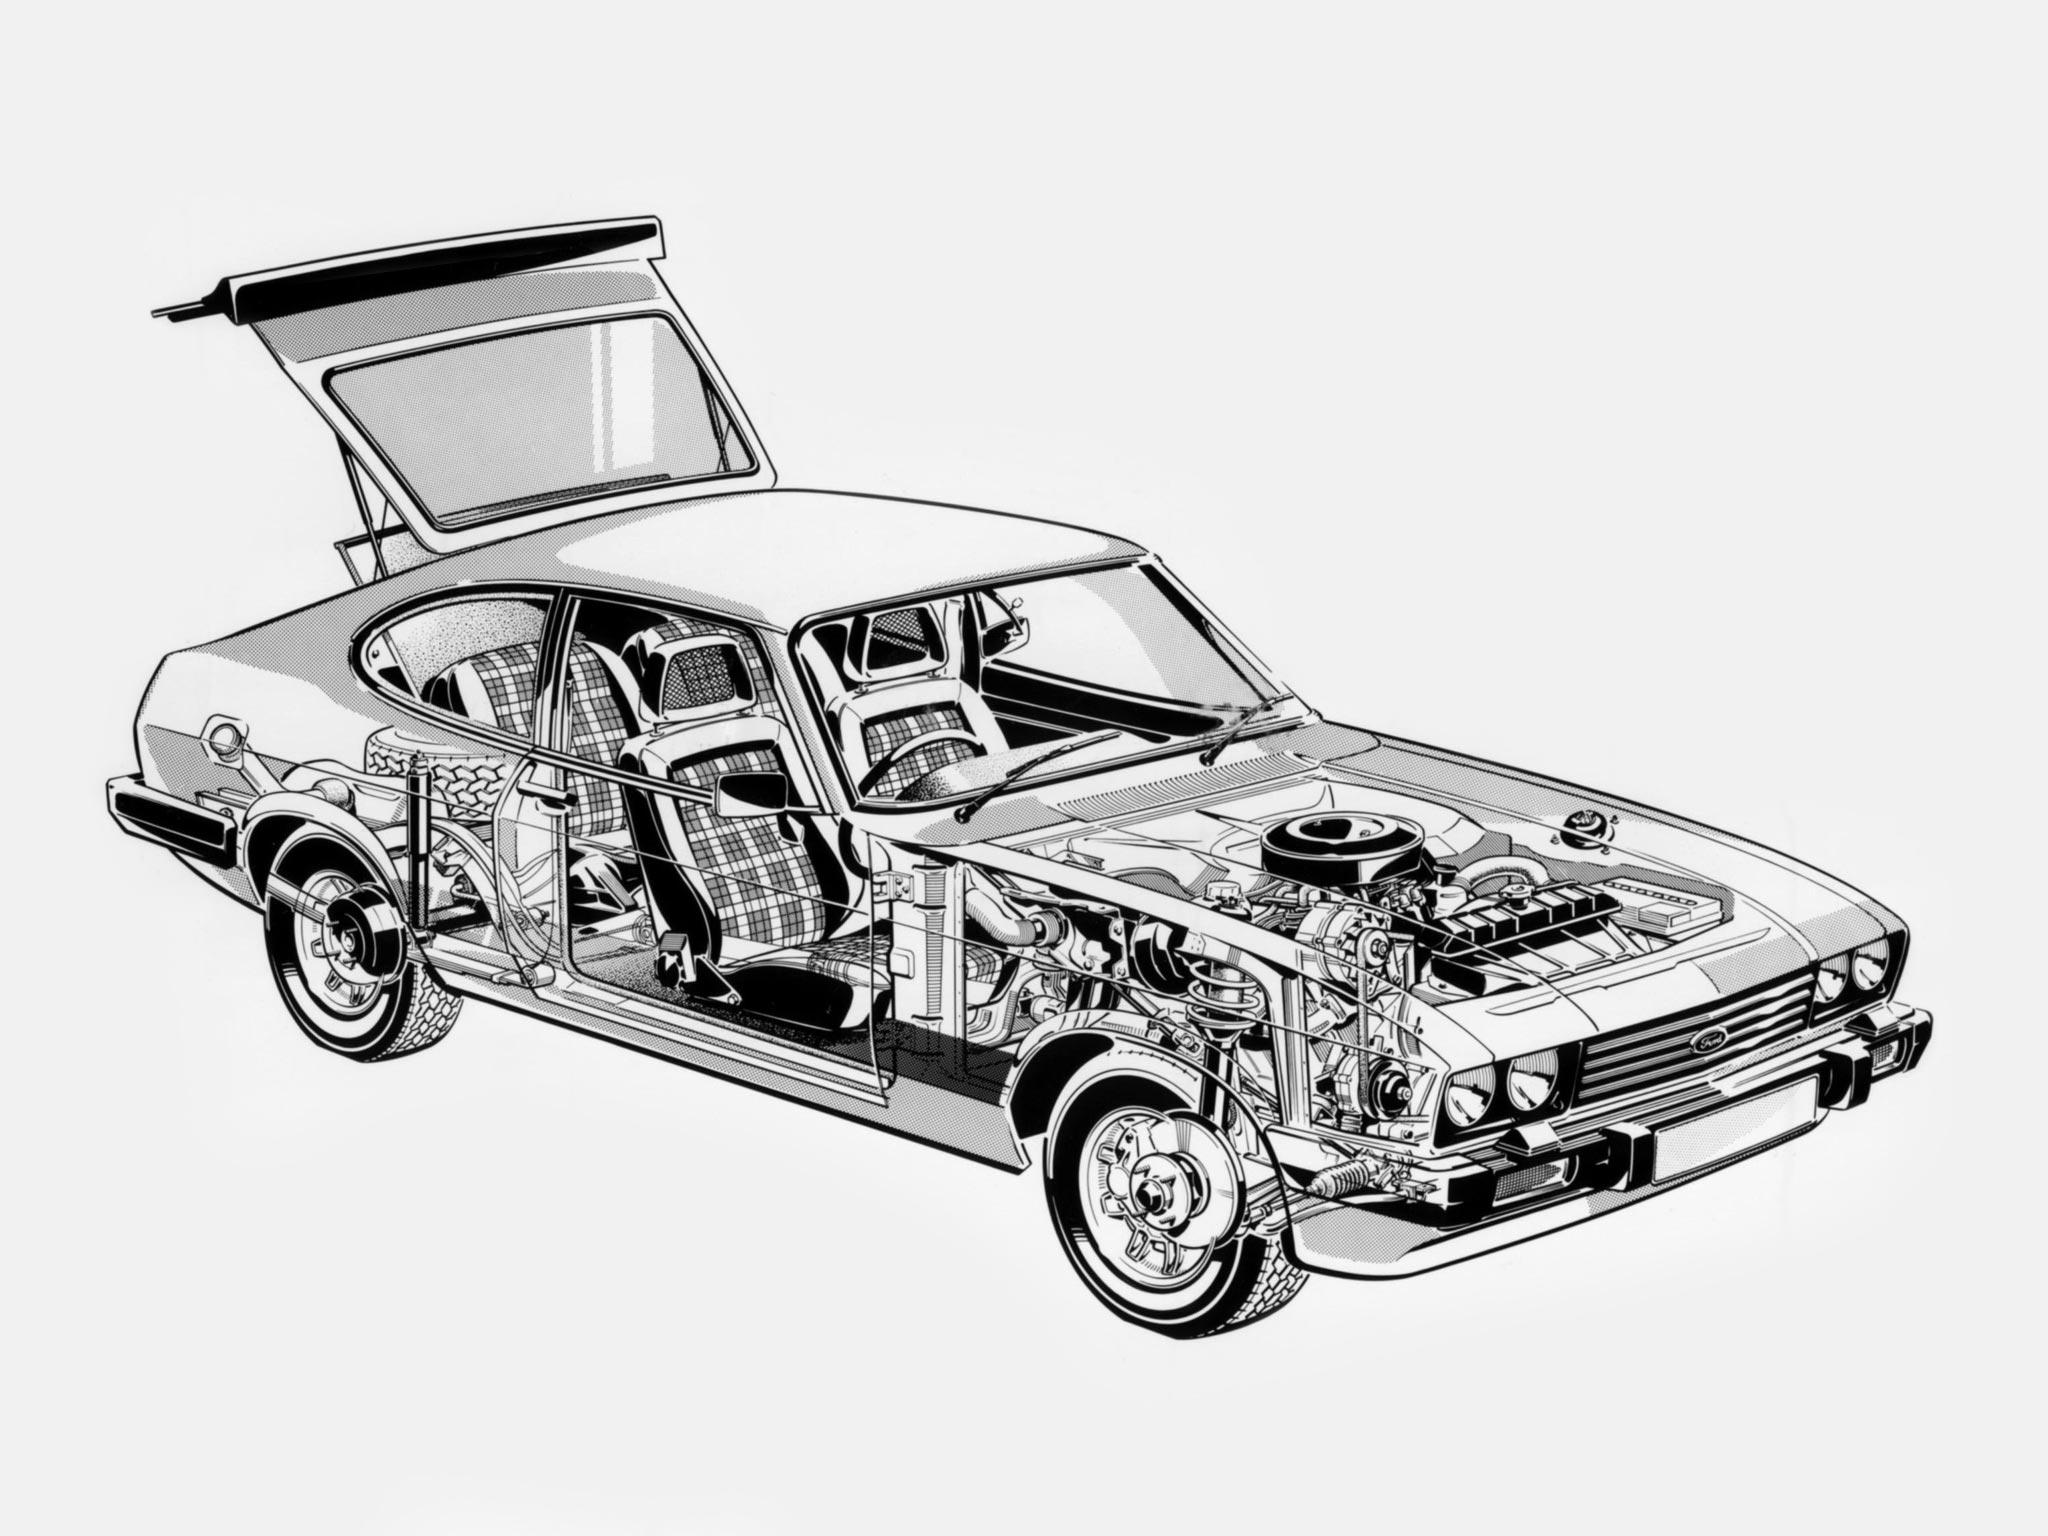 Ford Capri S cutaway drawing